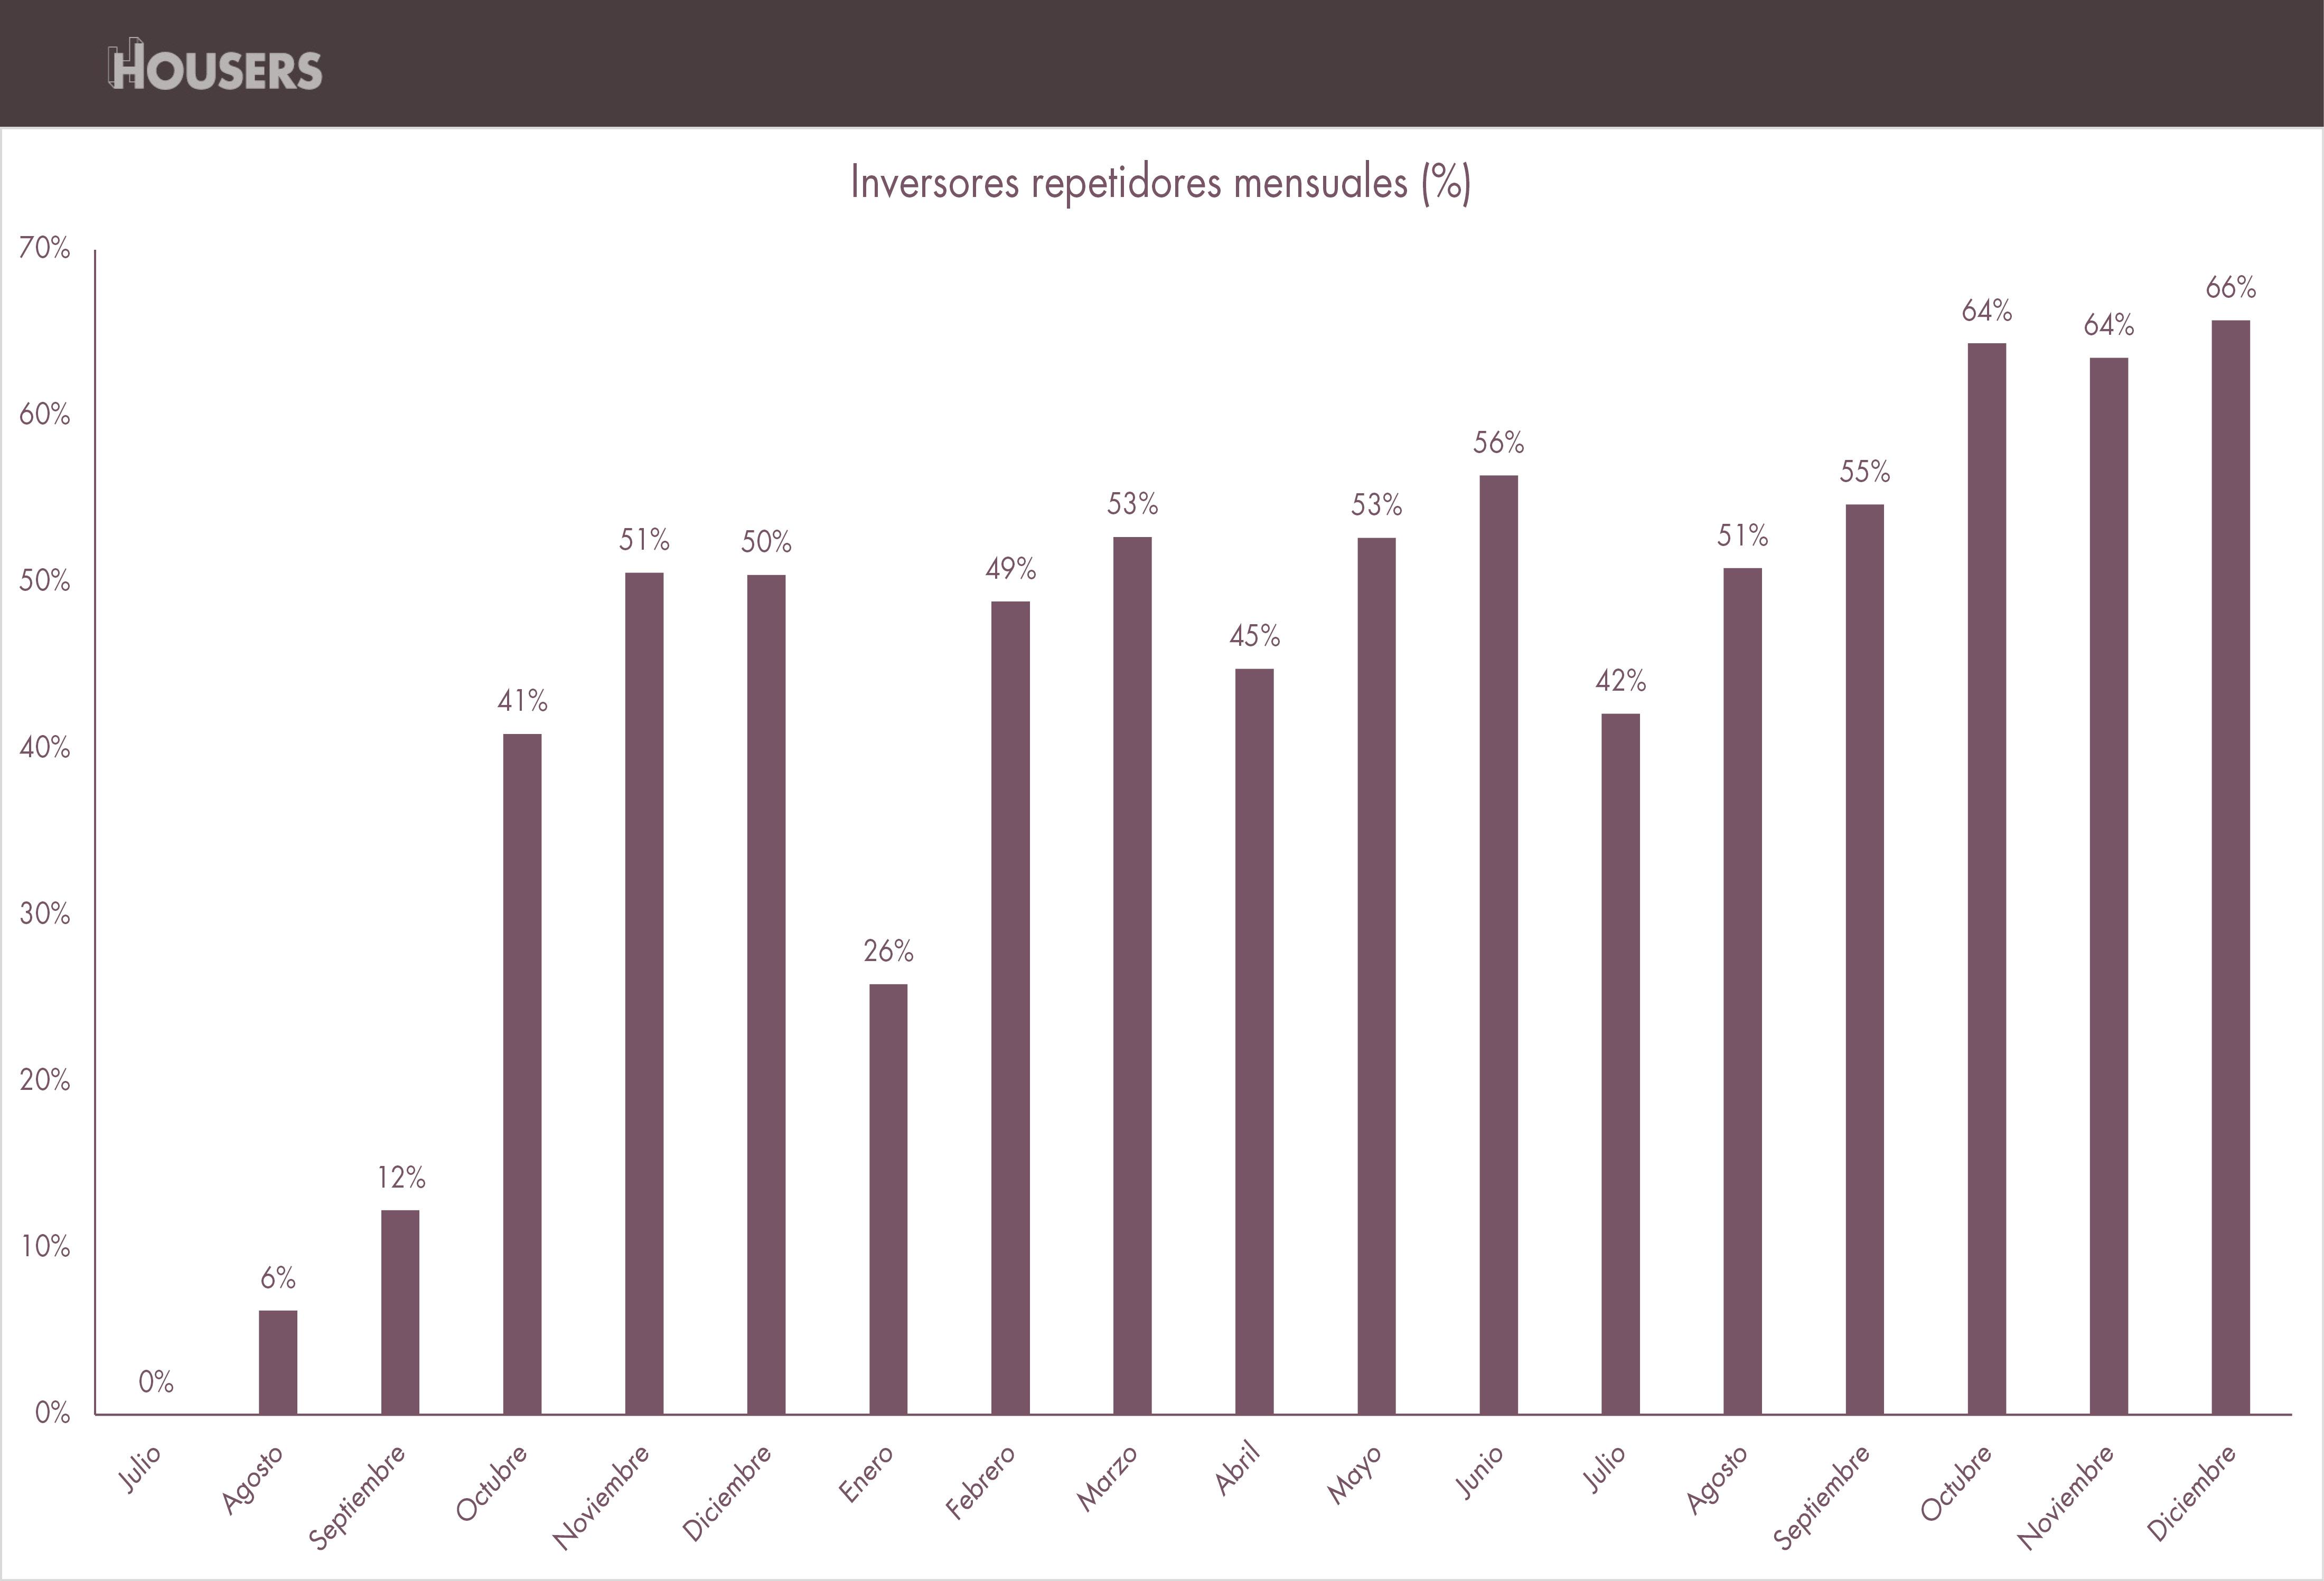 datos housers diciembre 2016 inversores repetidores mensuales